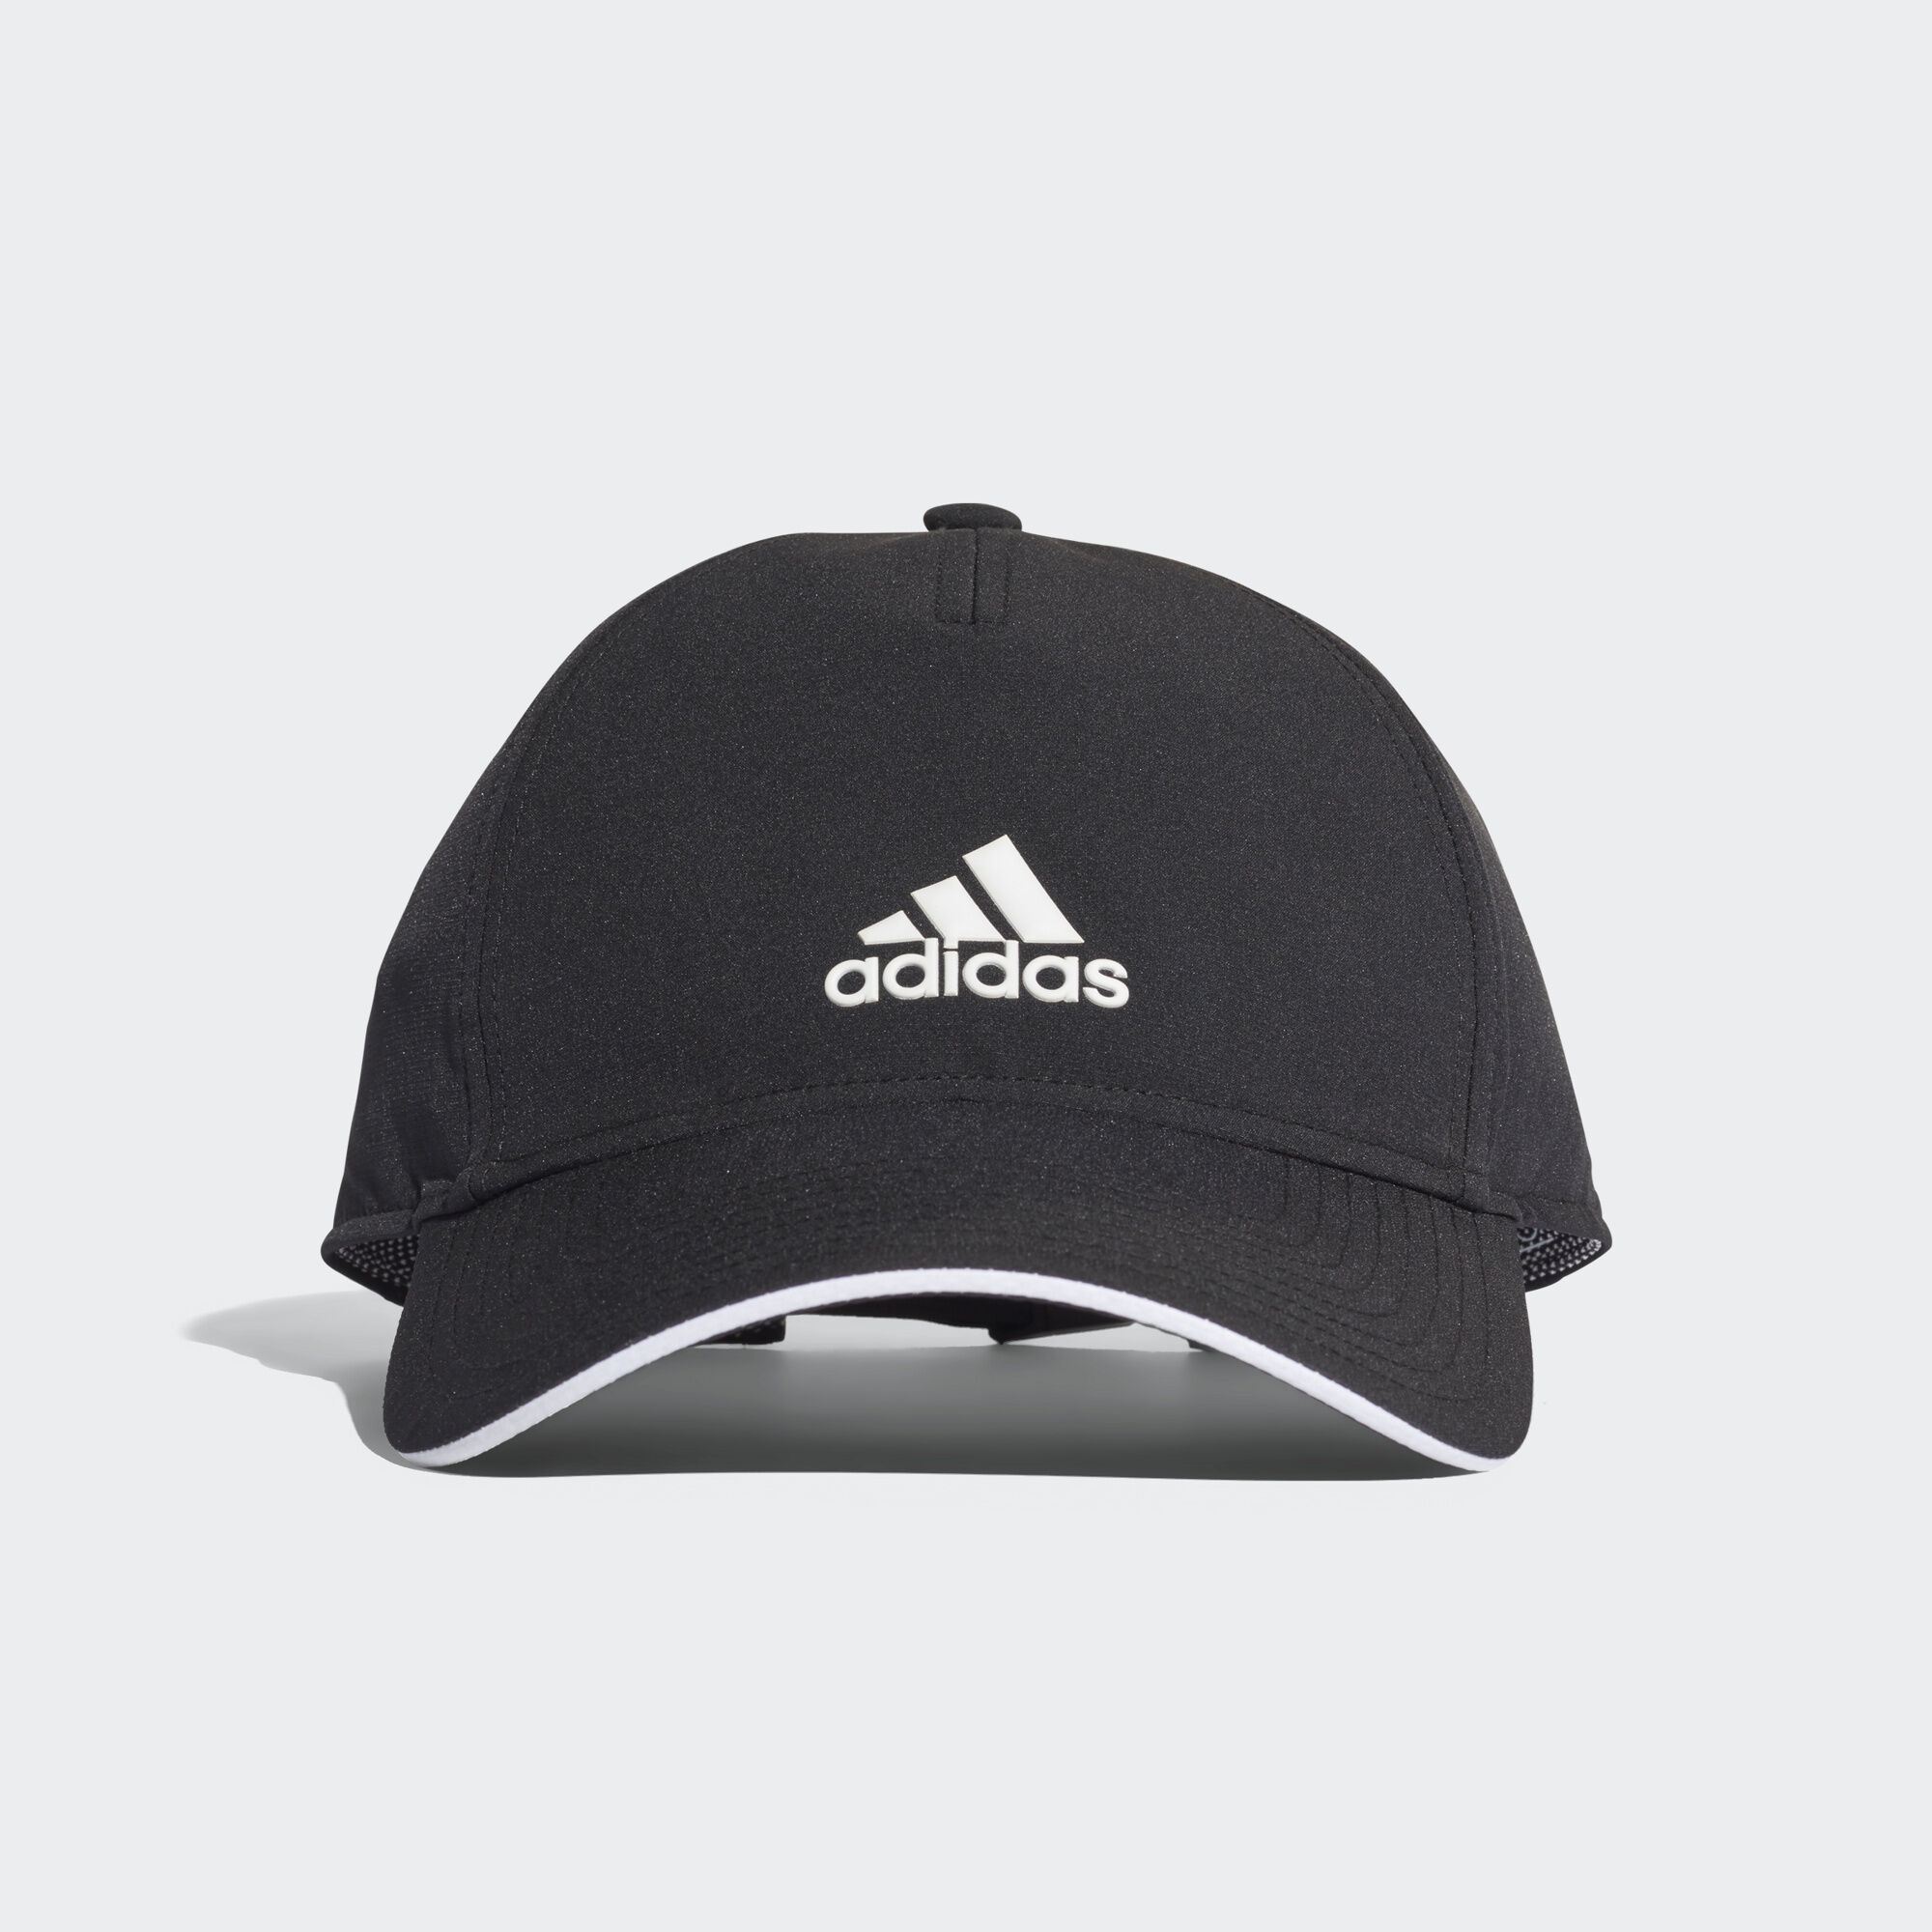 adidas - C40 Climalite Cap Black Black White CG1781. Training 6bf08eabddee